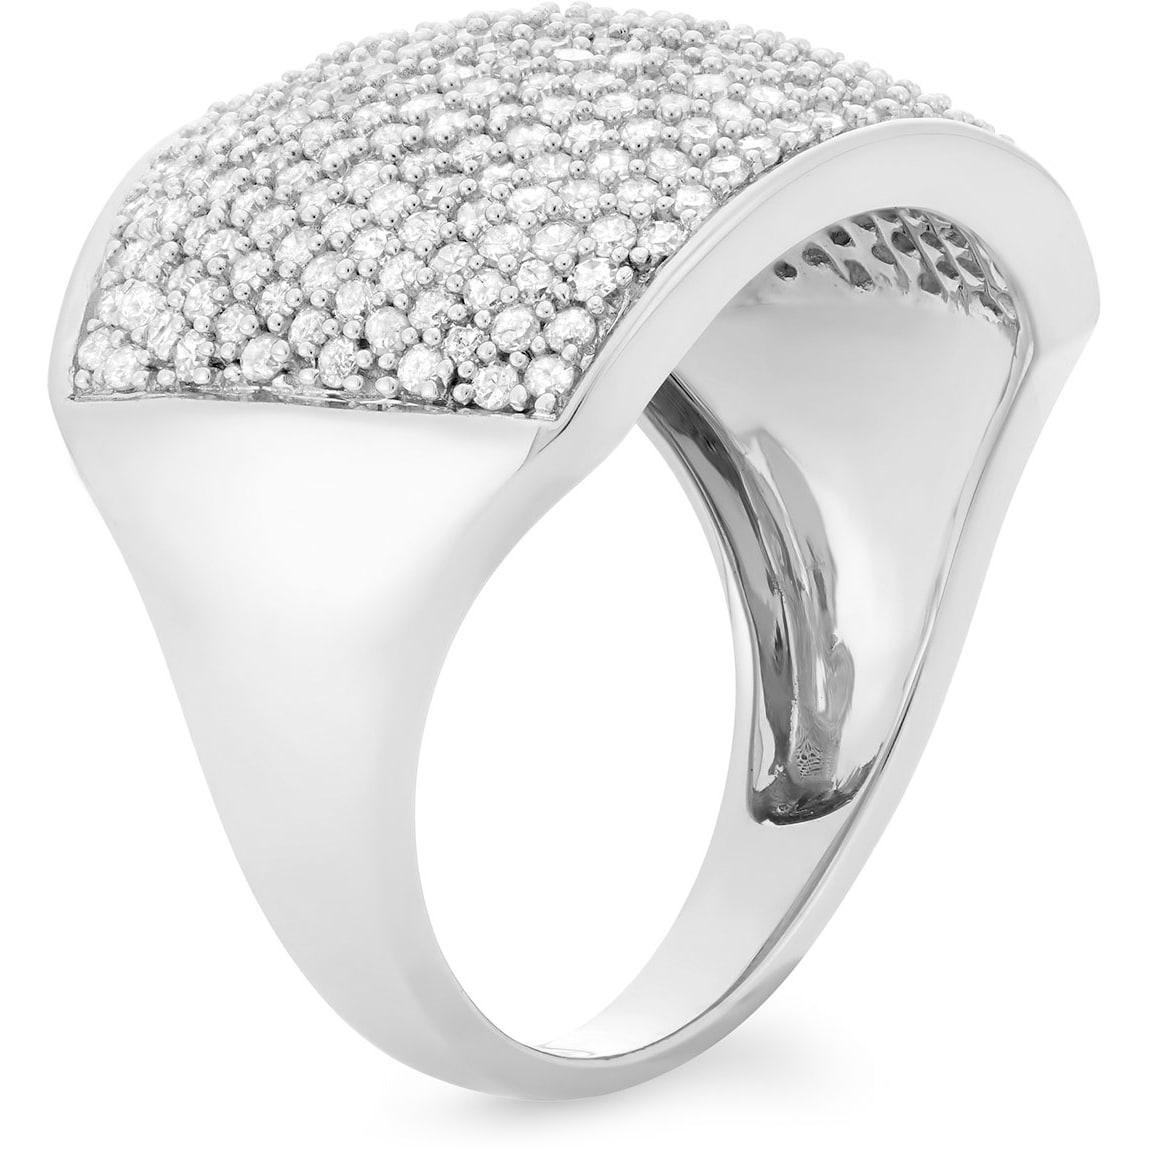 Overstock.com 10k White Gold 1 1/2ct TDW Diamond Ring (G-H, I1-I2) at Sears.com